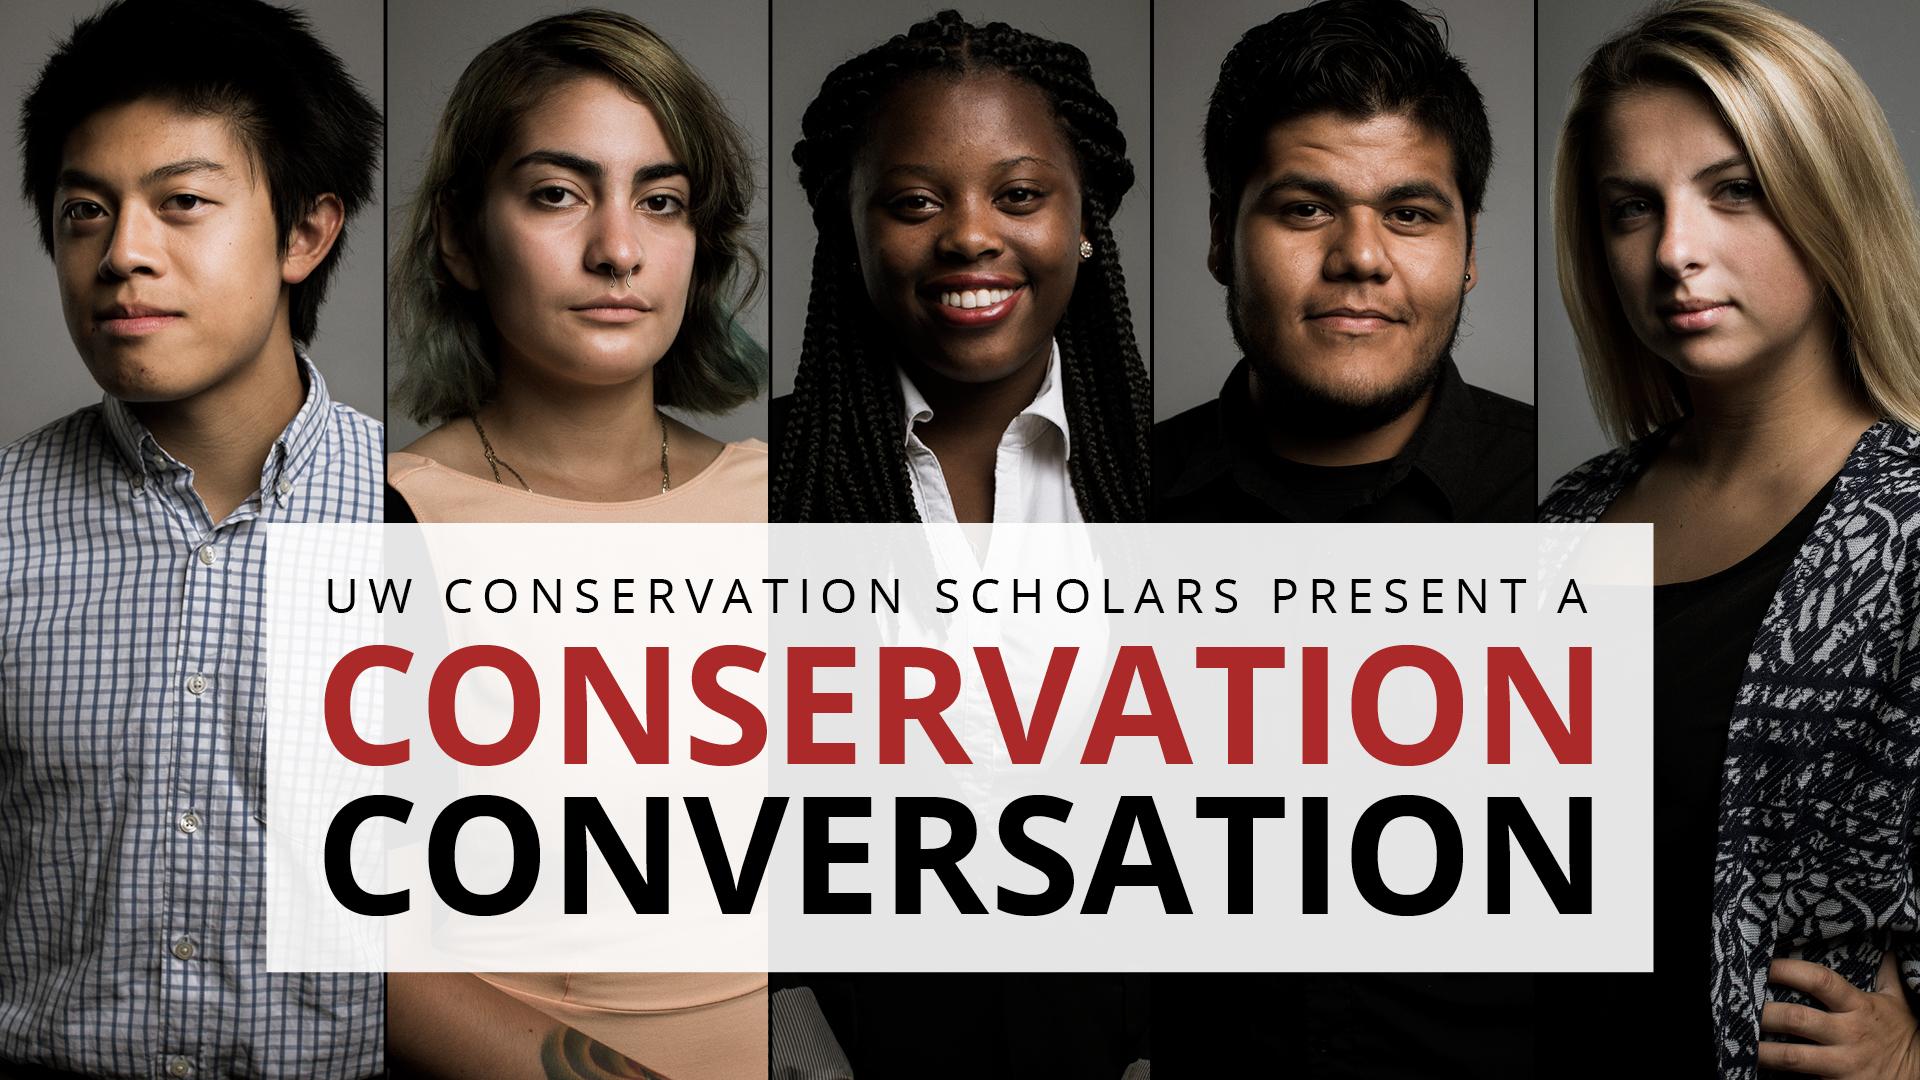 Conservation Conversation Film Poster